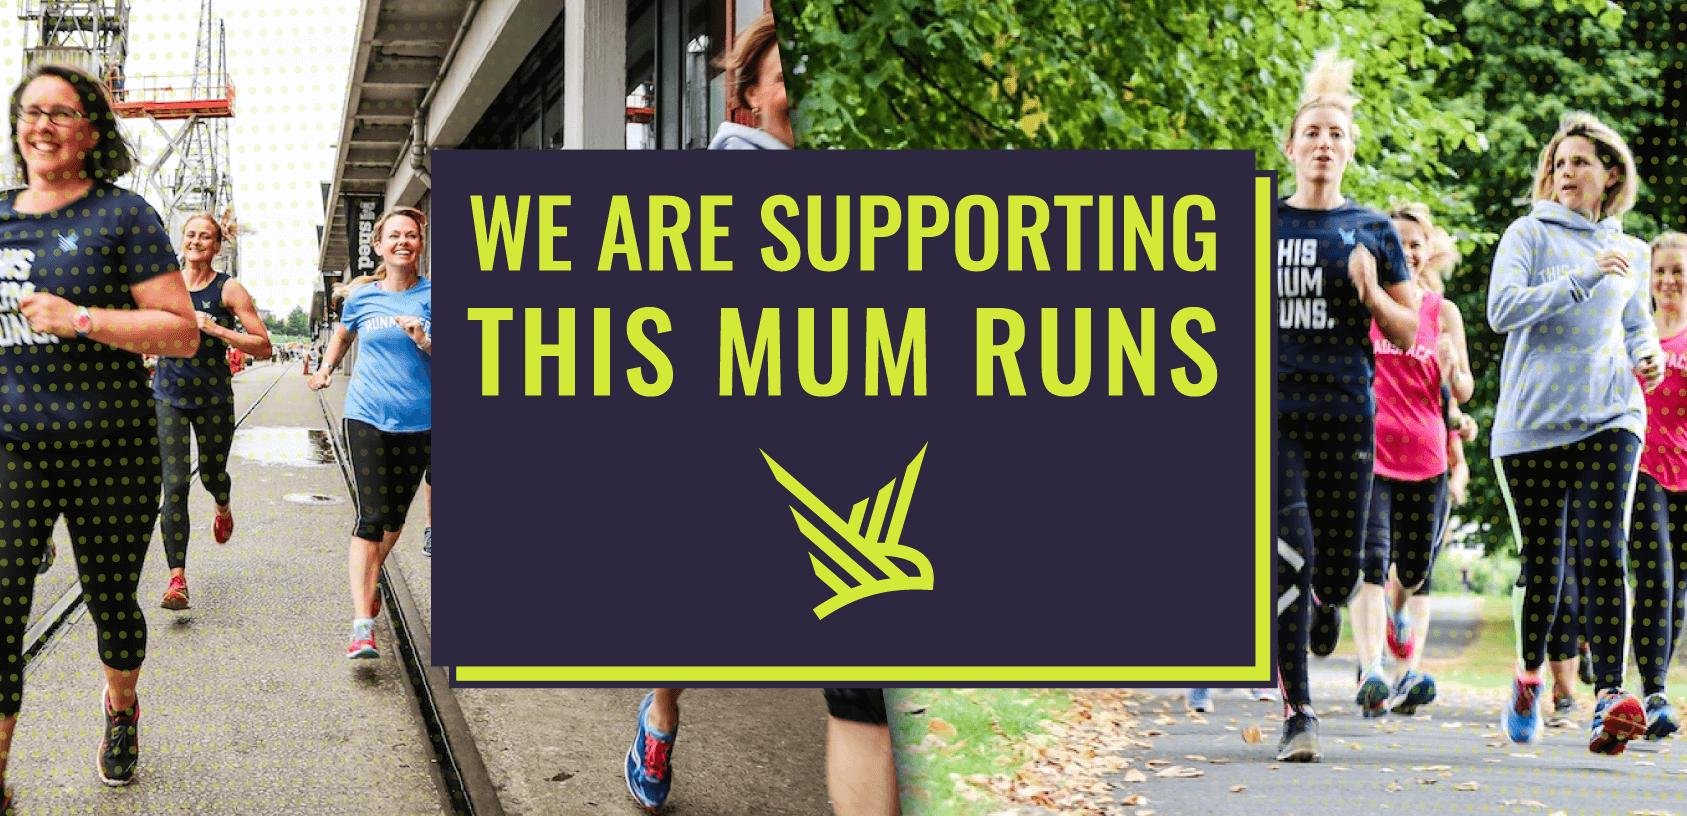 We Support This Mum Runs